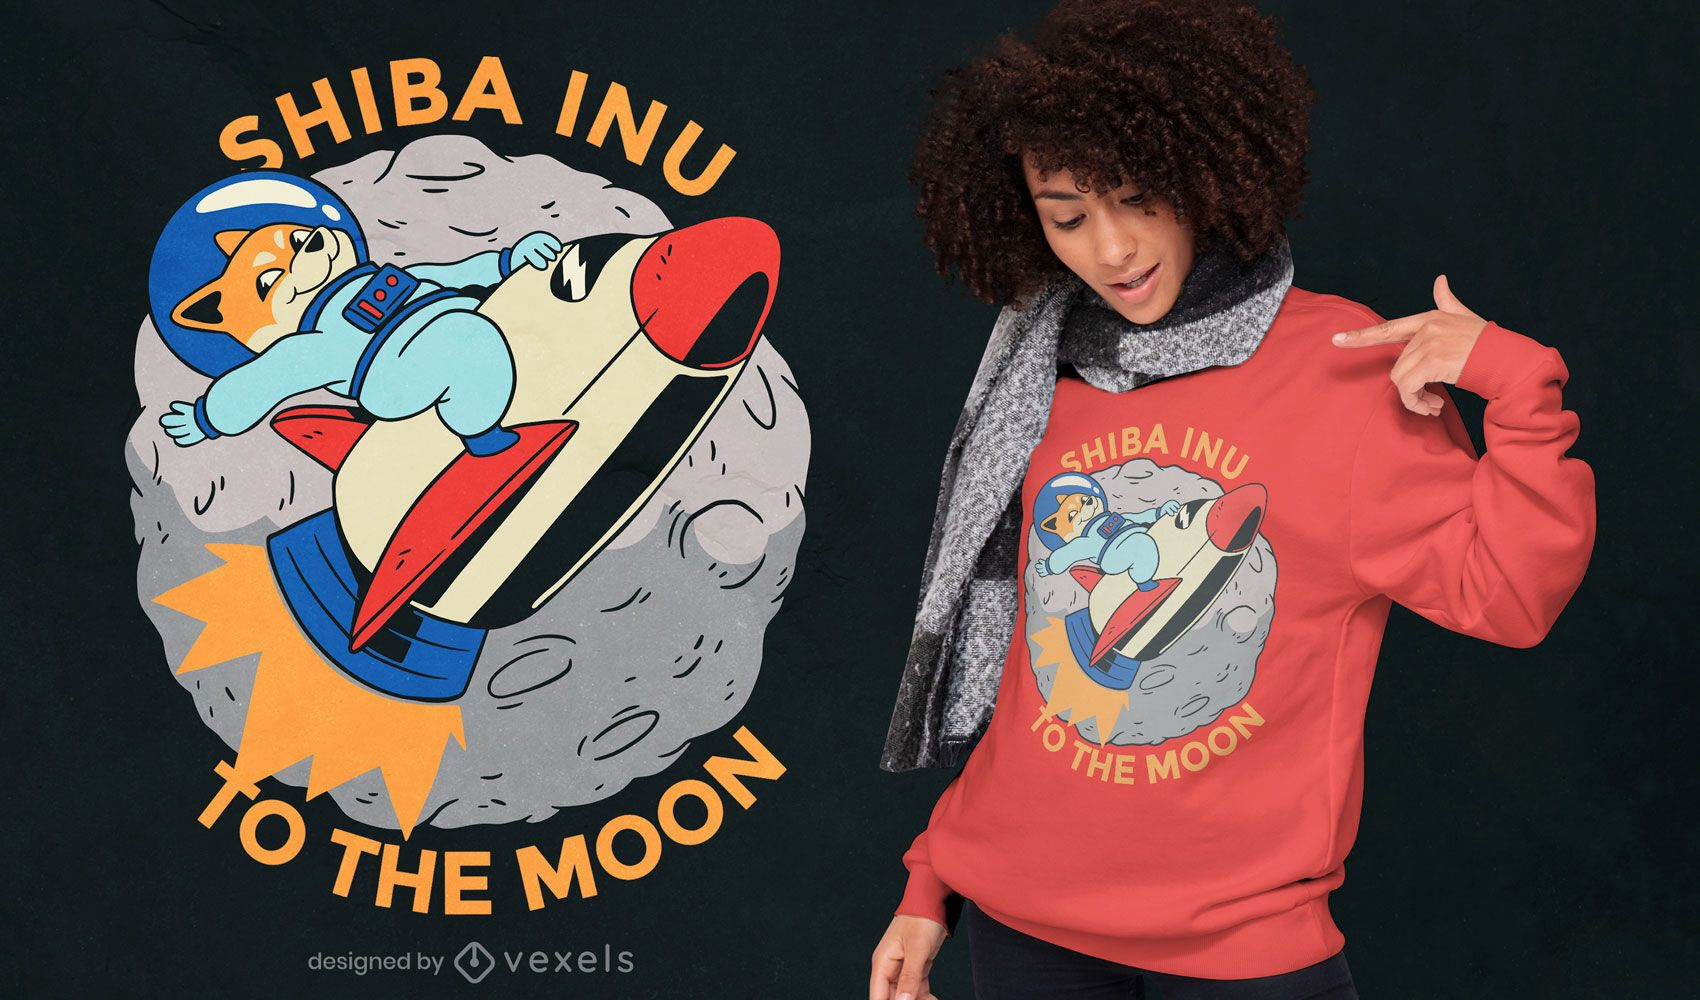 Shiba Inu coin to the moon t-shirt design